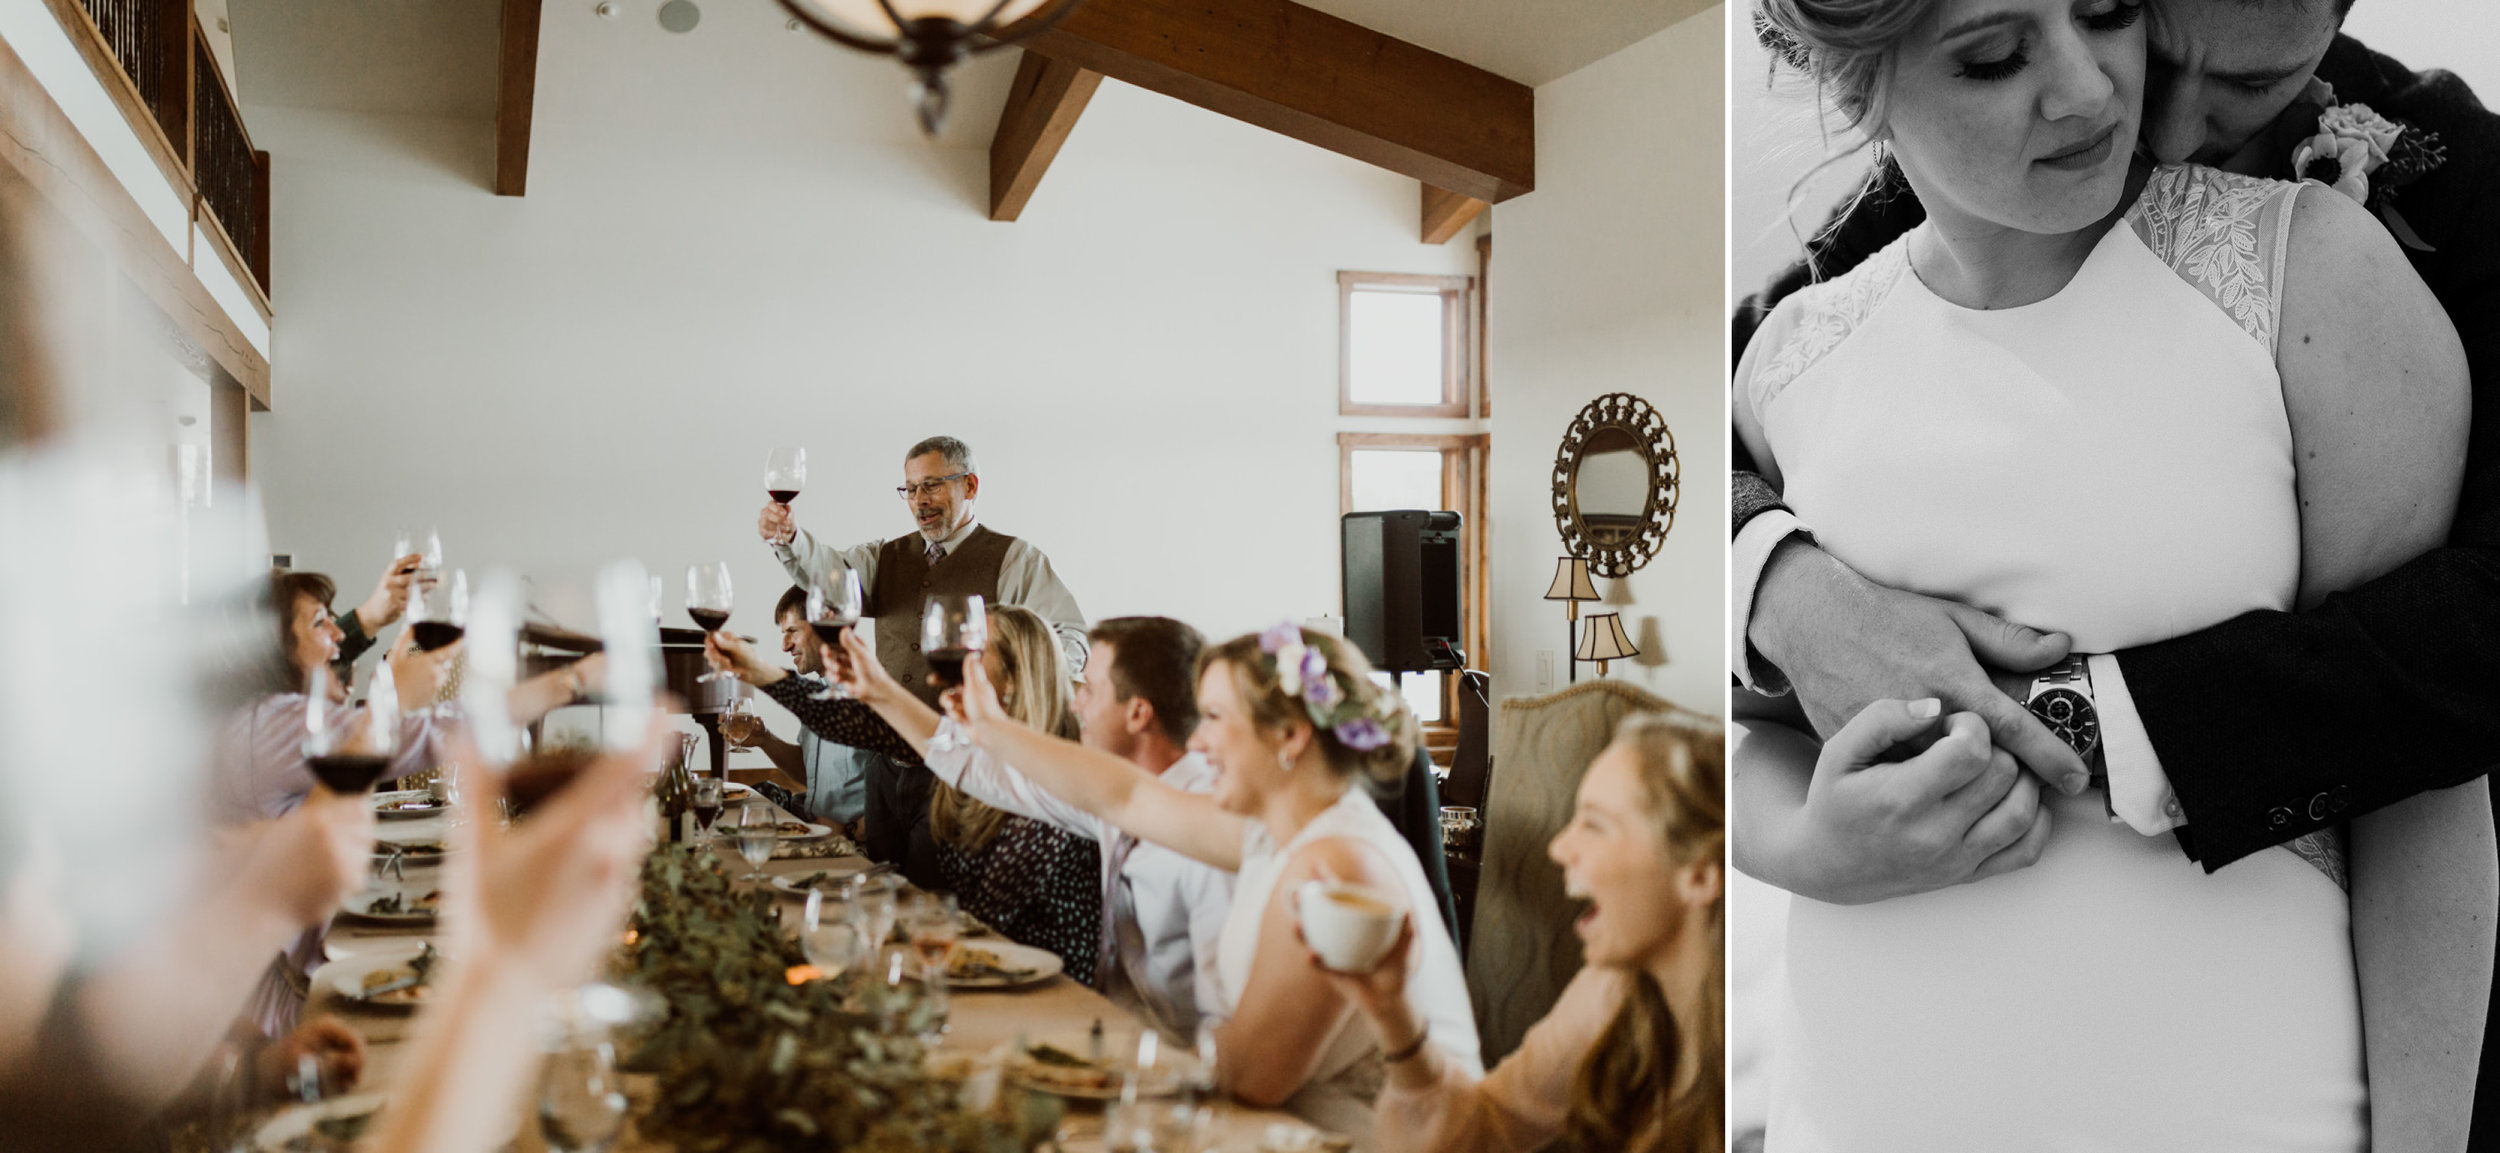 17-2-adventure-wedding-photographer-17.jpg